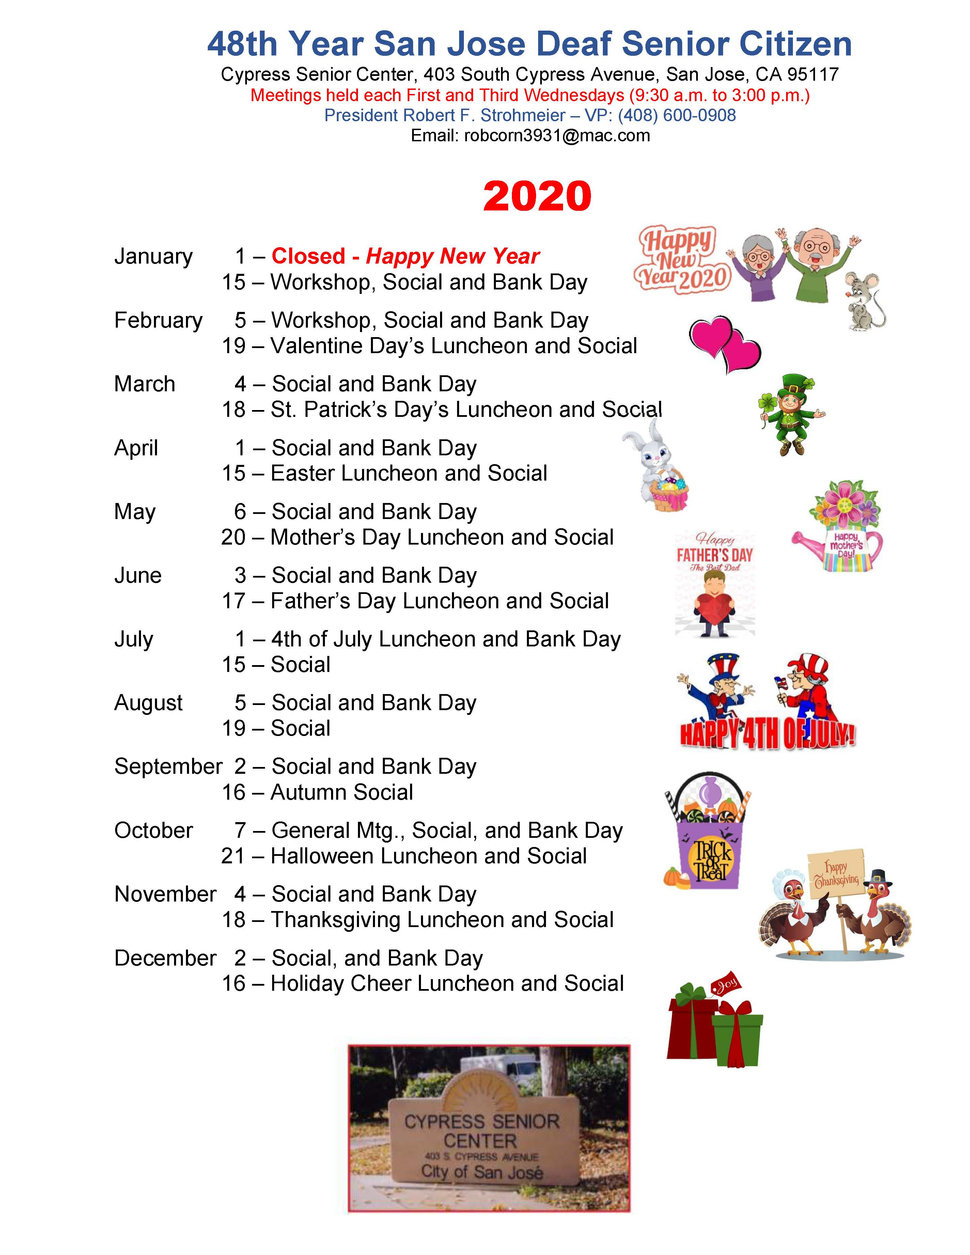 2020 San Jose DSC Calendar.jpg